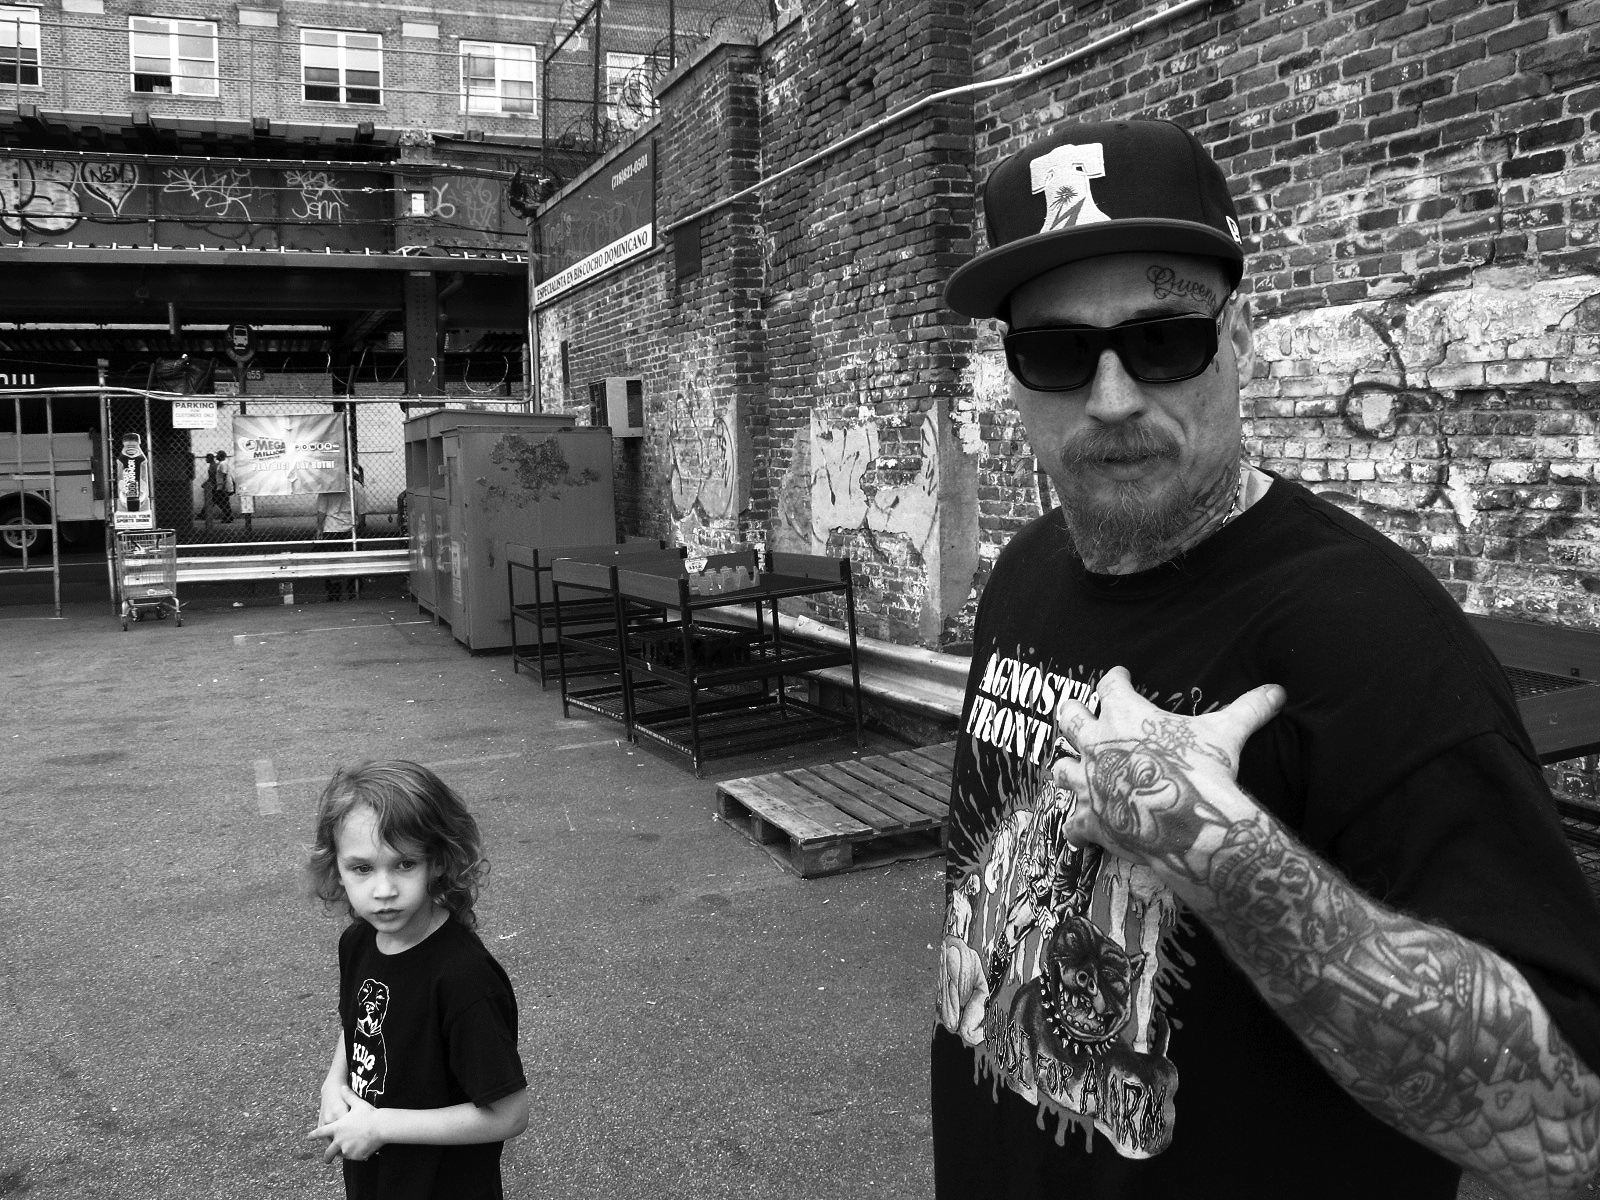 Danny + Dillinger